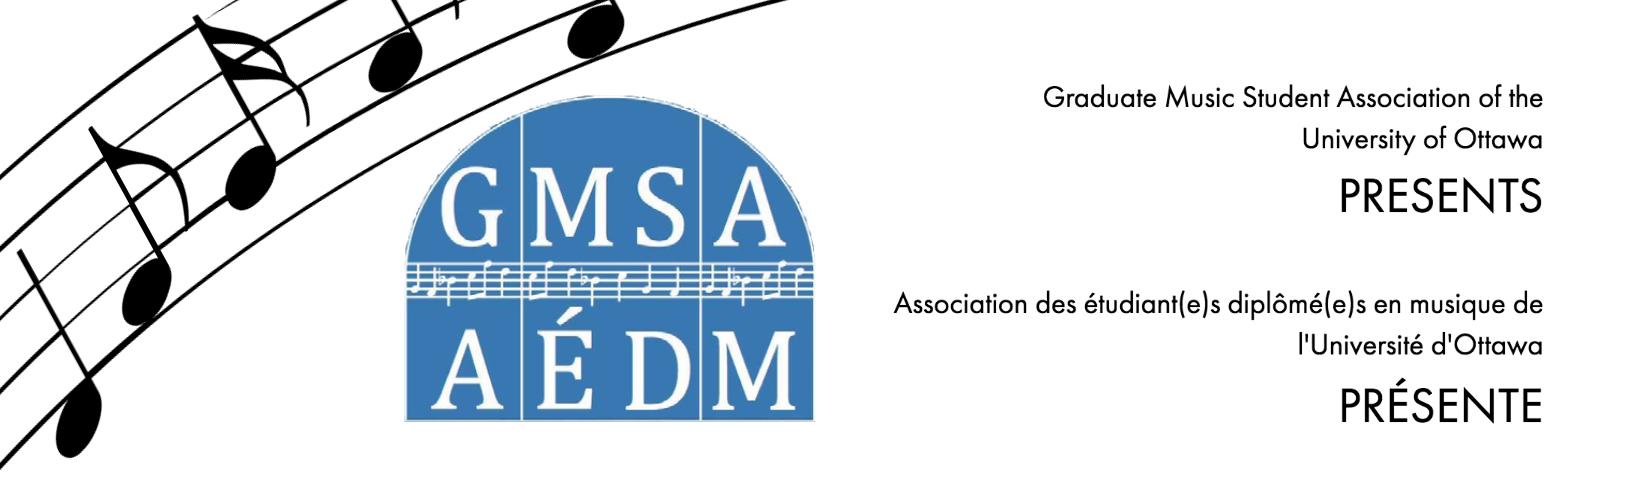 GMSA Logo